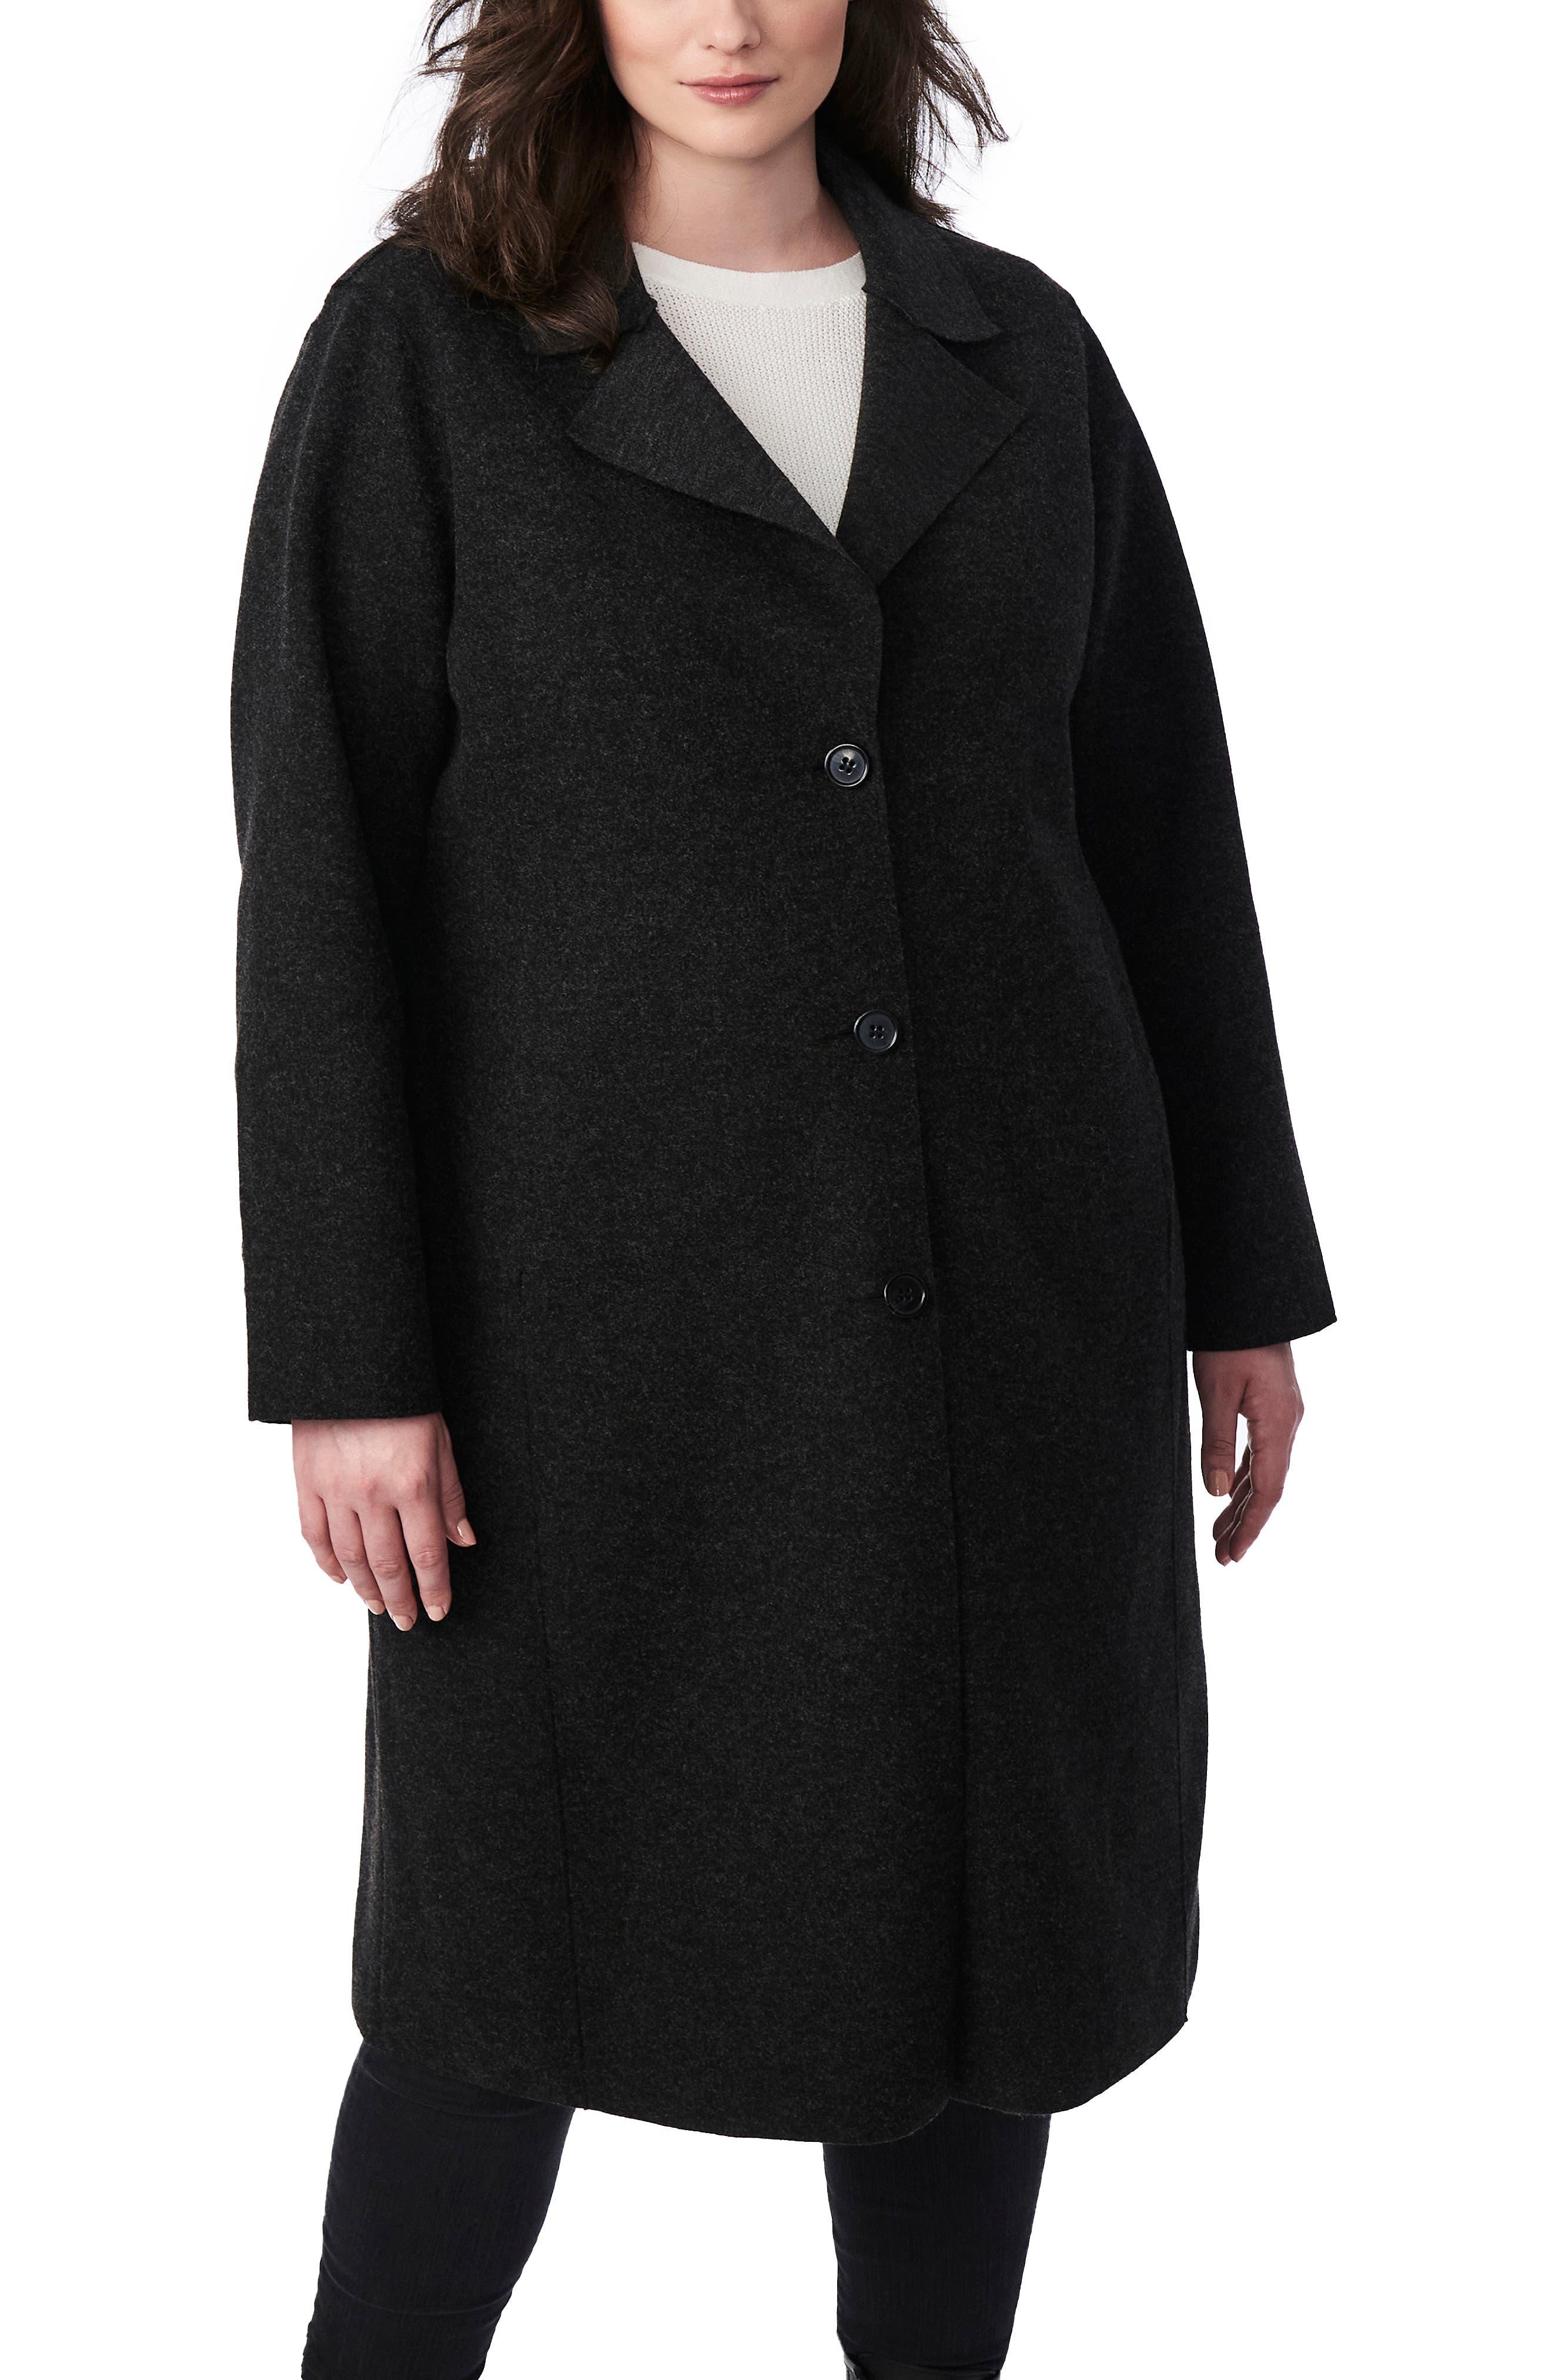 Vintage Coats & Jackets | Retro Coats and Jackets Plus Size Womens Bernardo Sweater Long Coat $136.90 AT vintagedancer.com